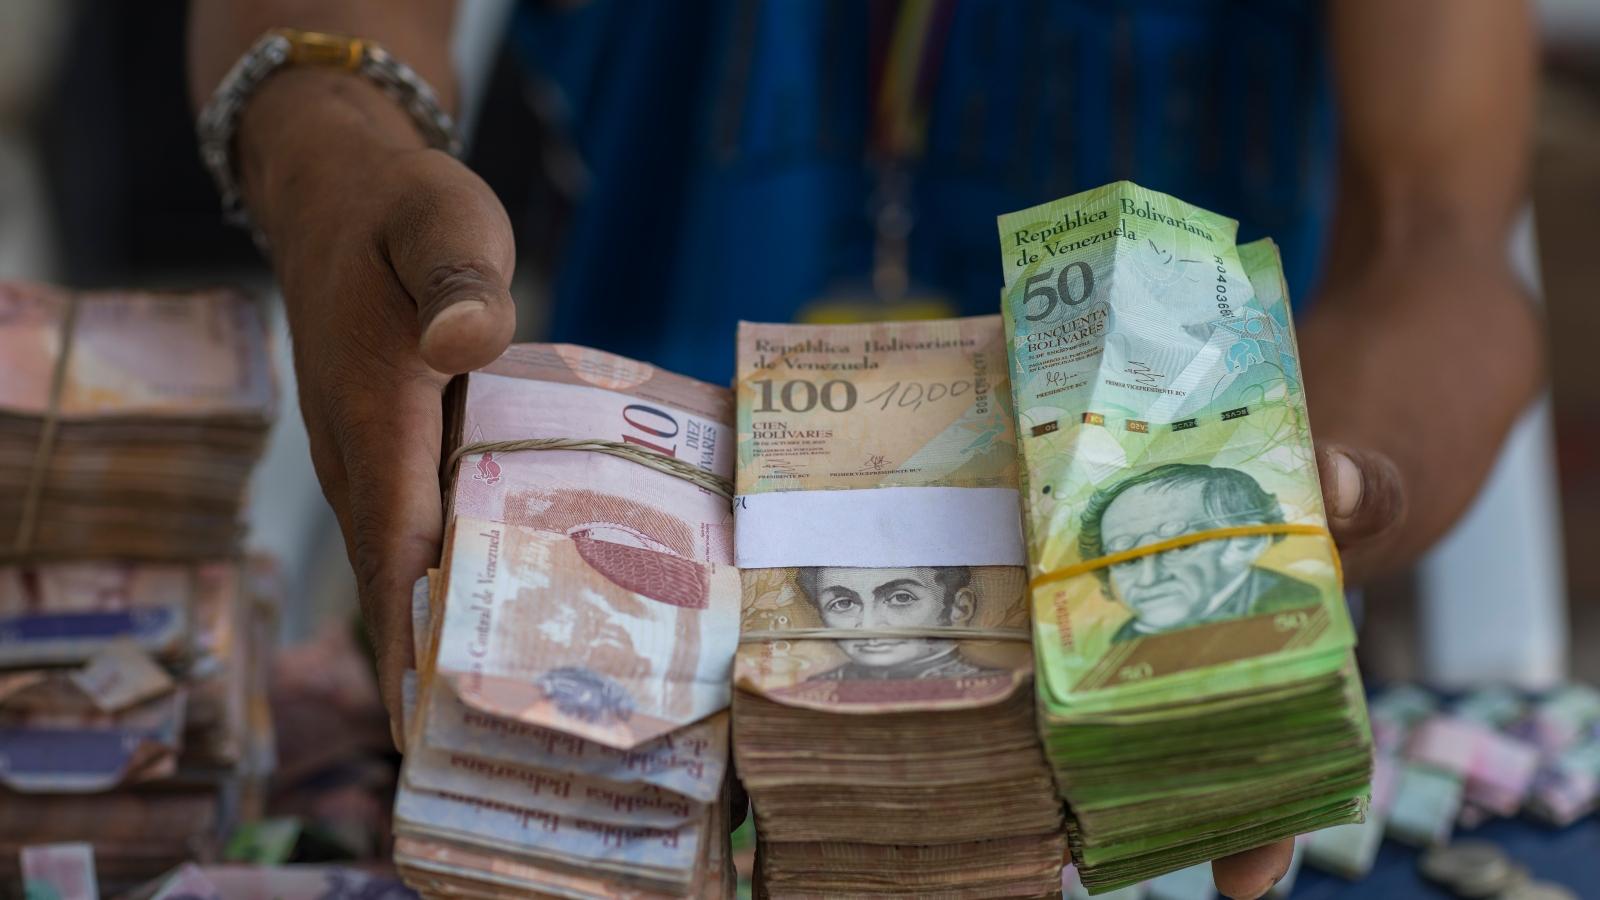 Inflación venezolana llegó a 815.194 por ciento en mayo, según Parlamento